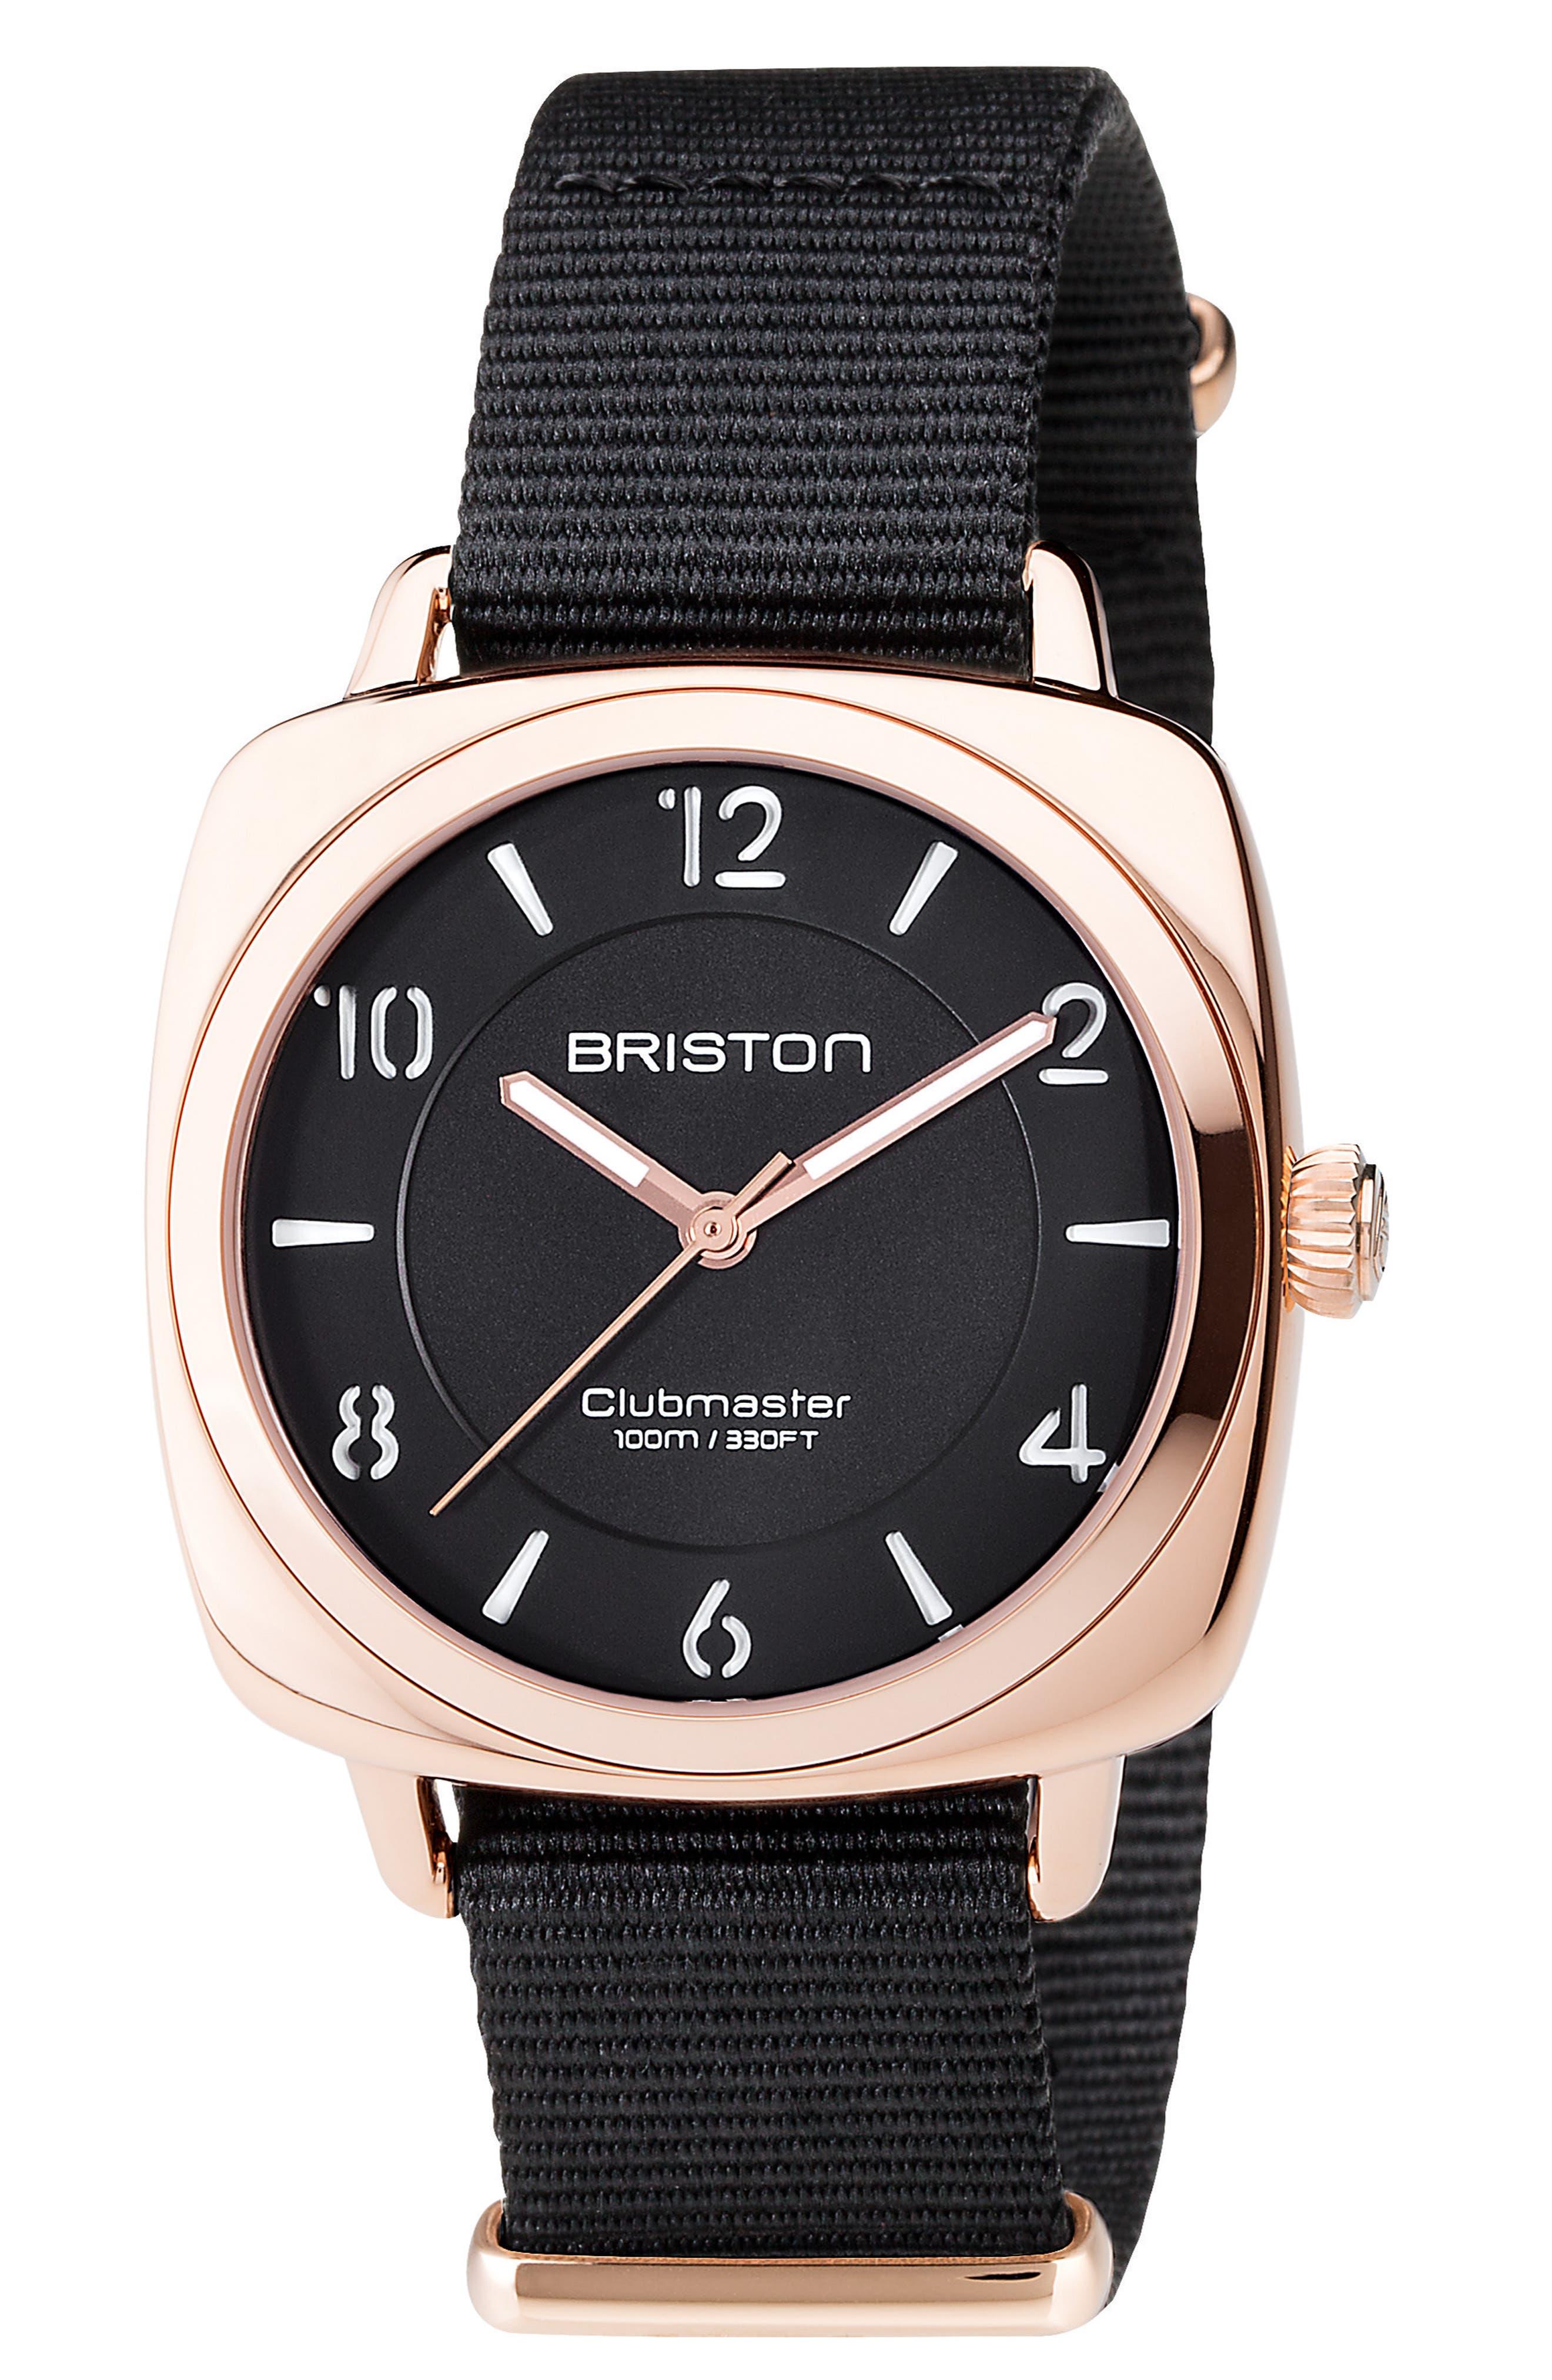 Main Image - Briston Watches Clubmaster Chic Nylon Strap Watch, 36mm